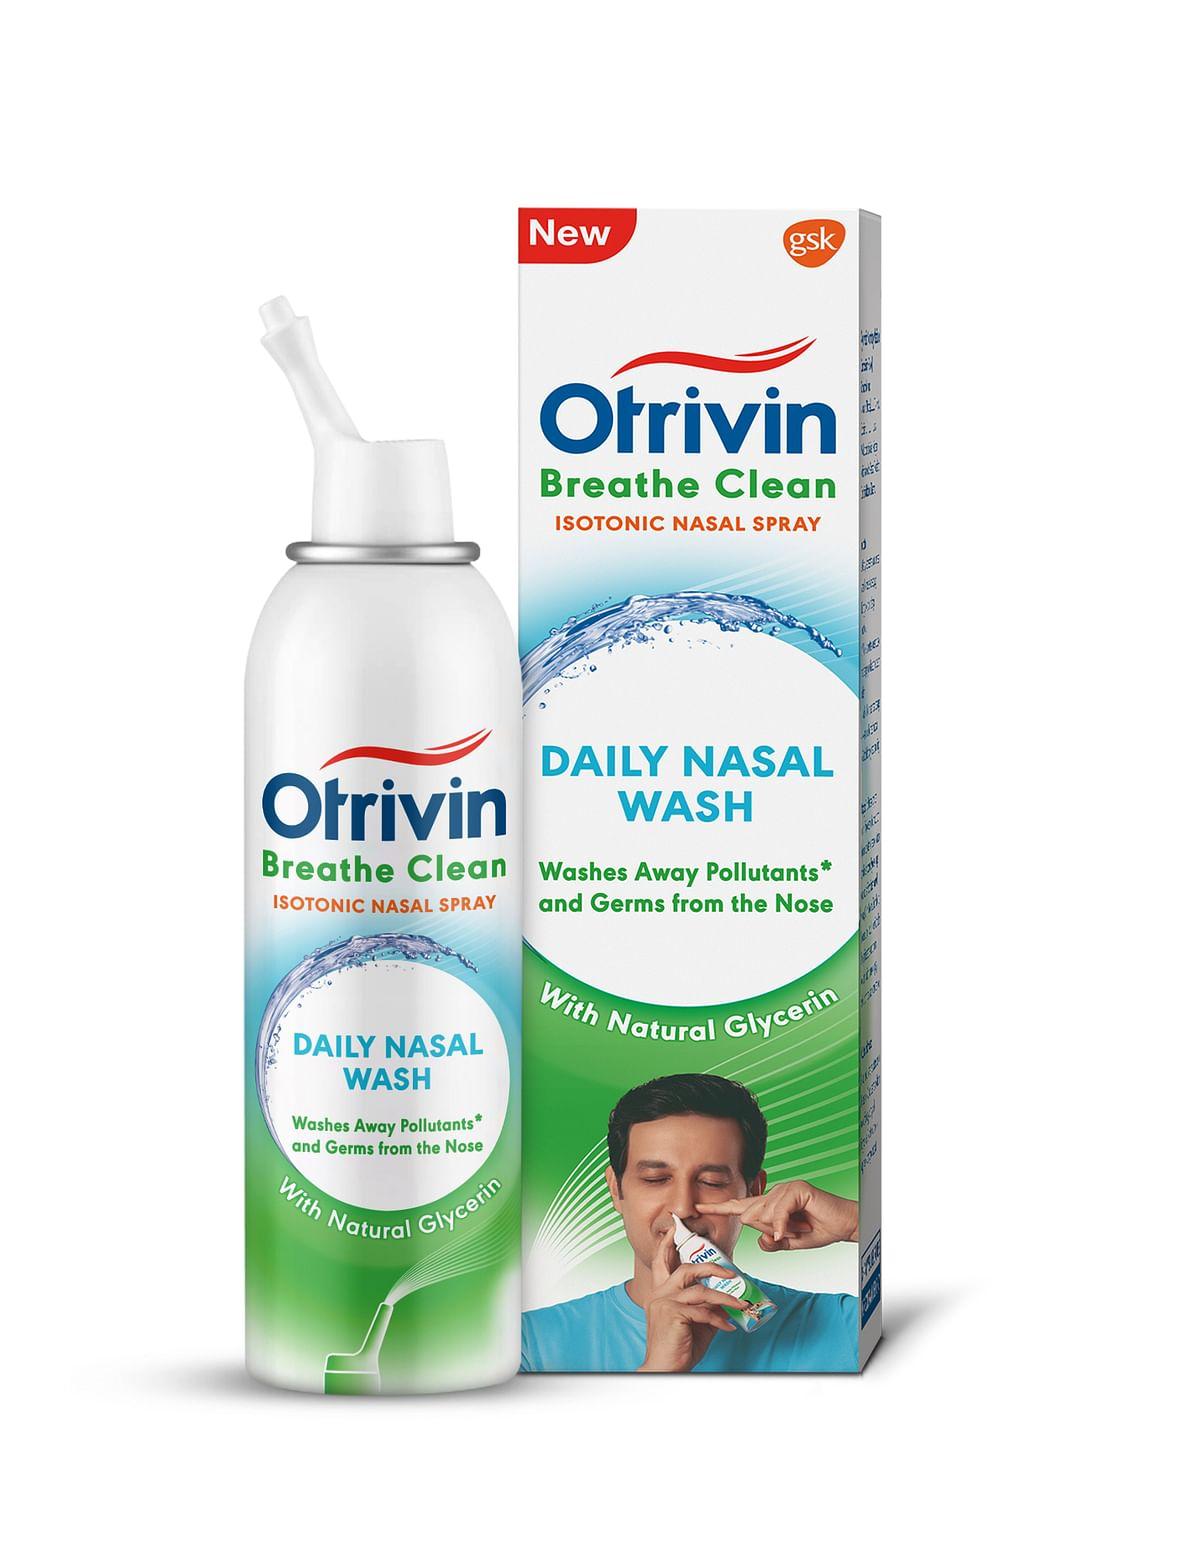 Otrivin Breathe Clean Daily Nasal Wash